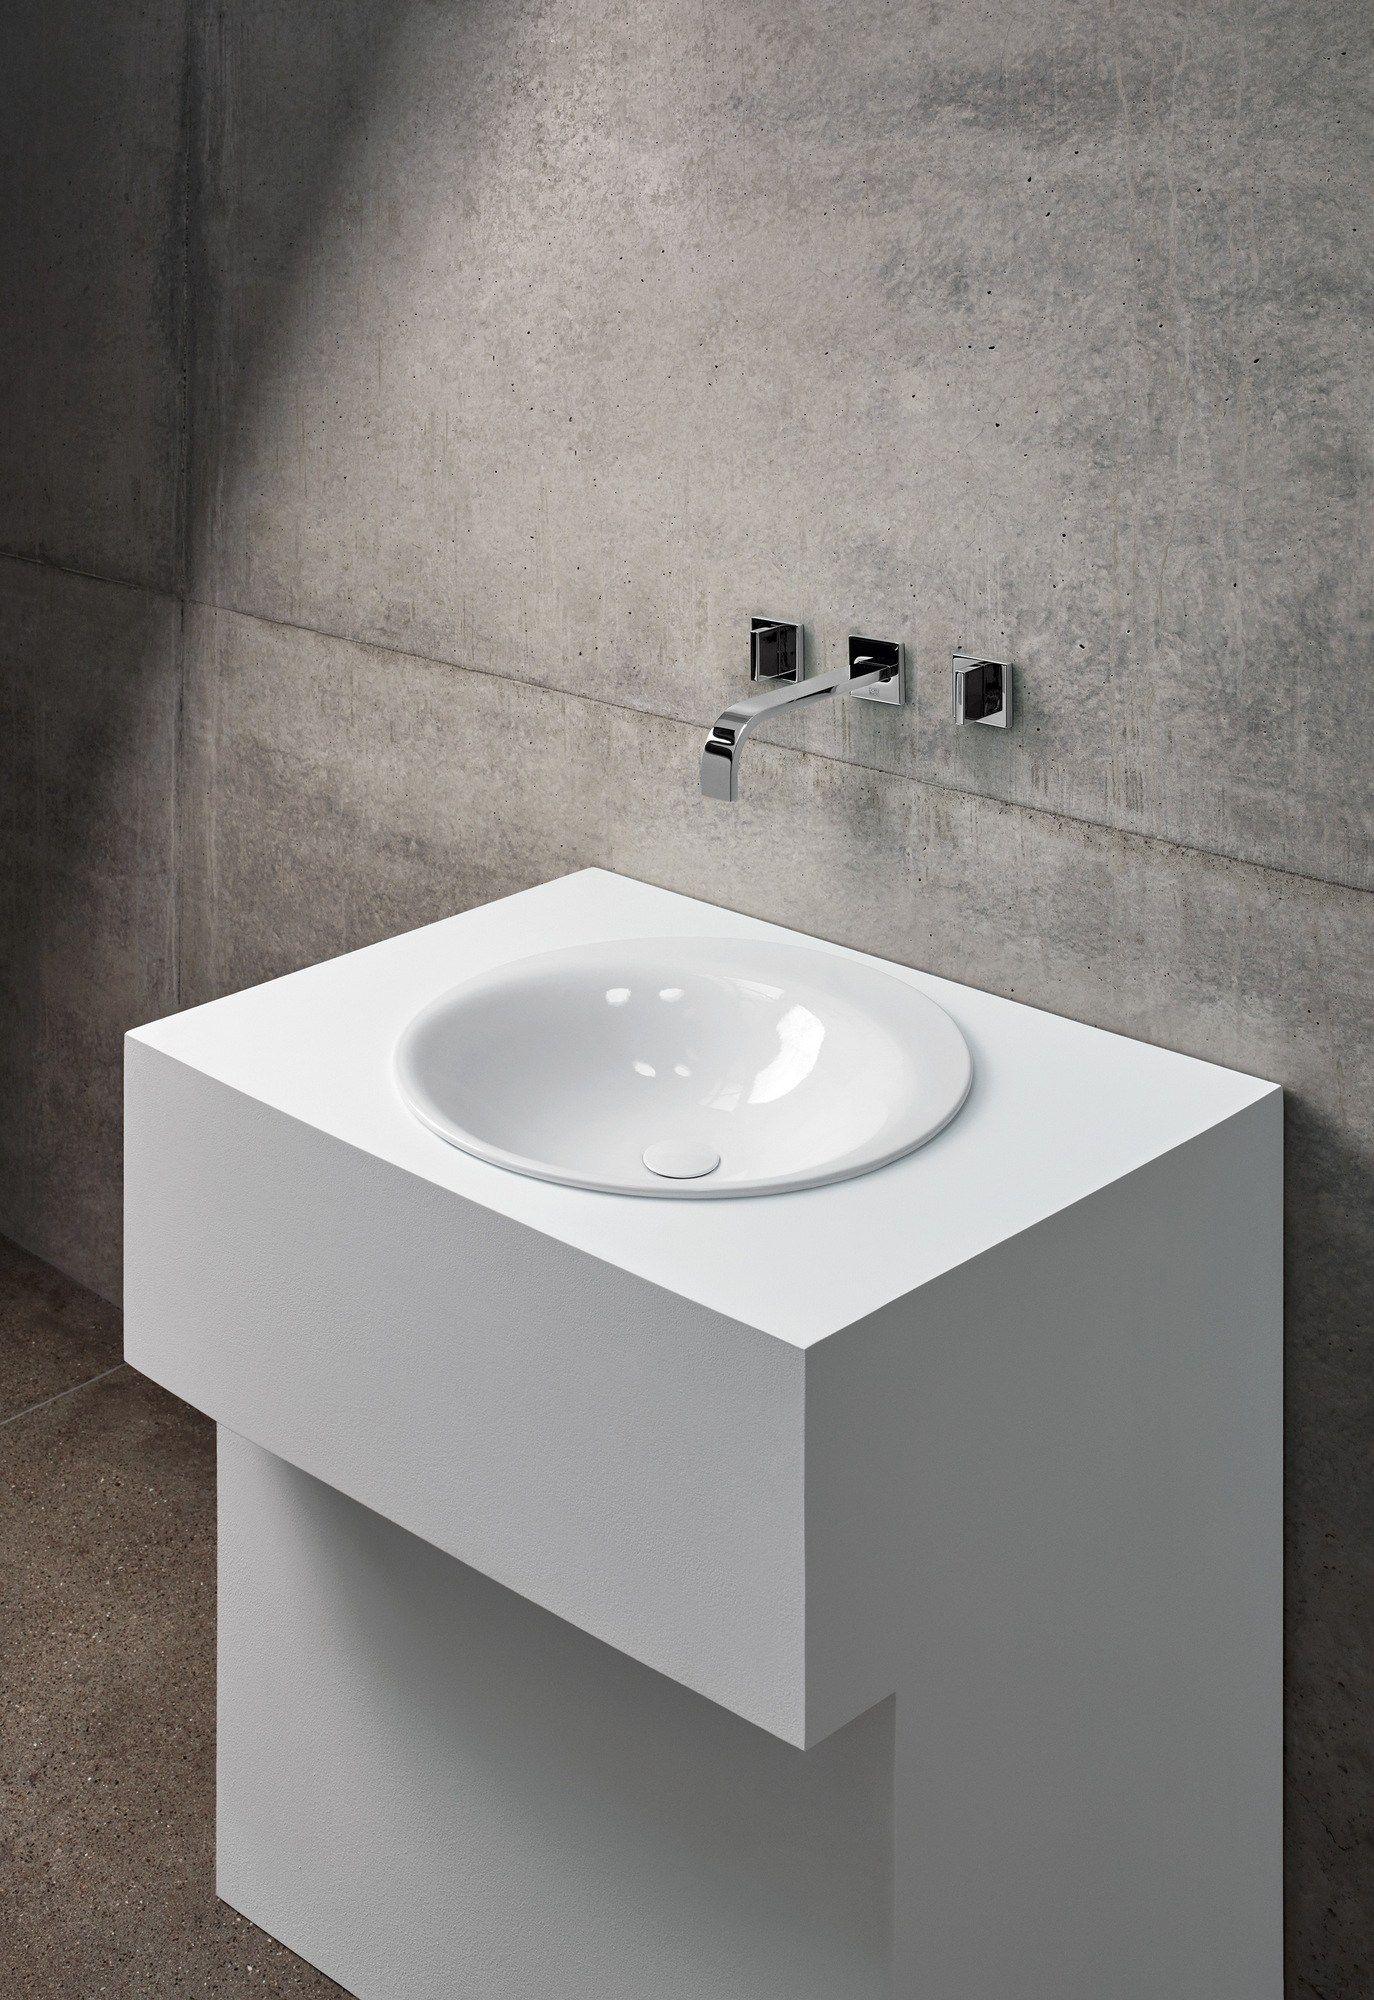 bettelux oval washbasin by bette design tesseraux partner